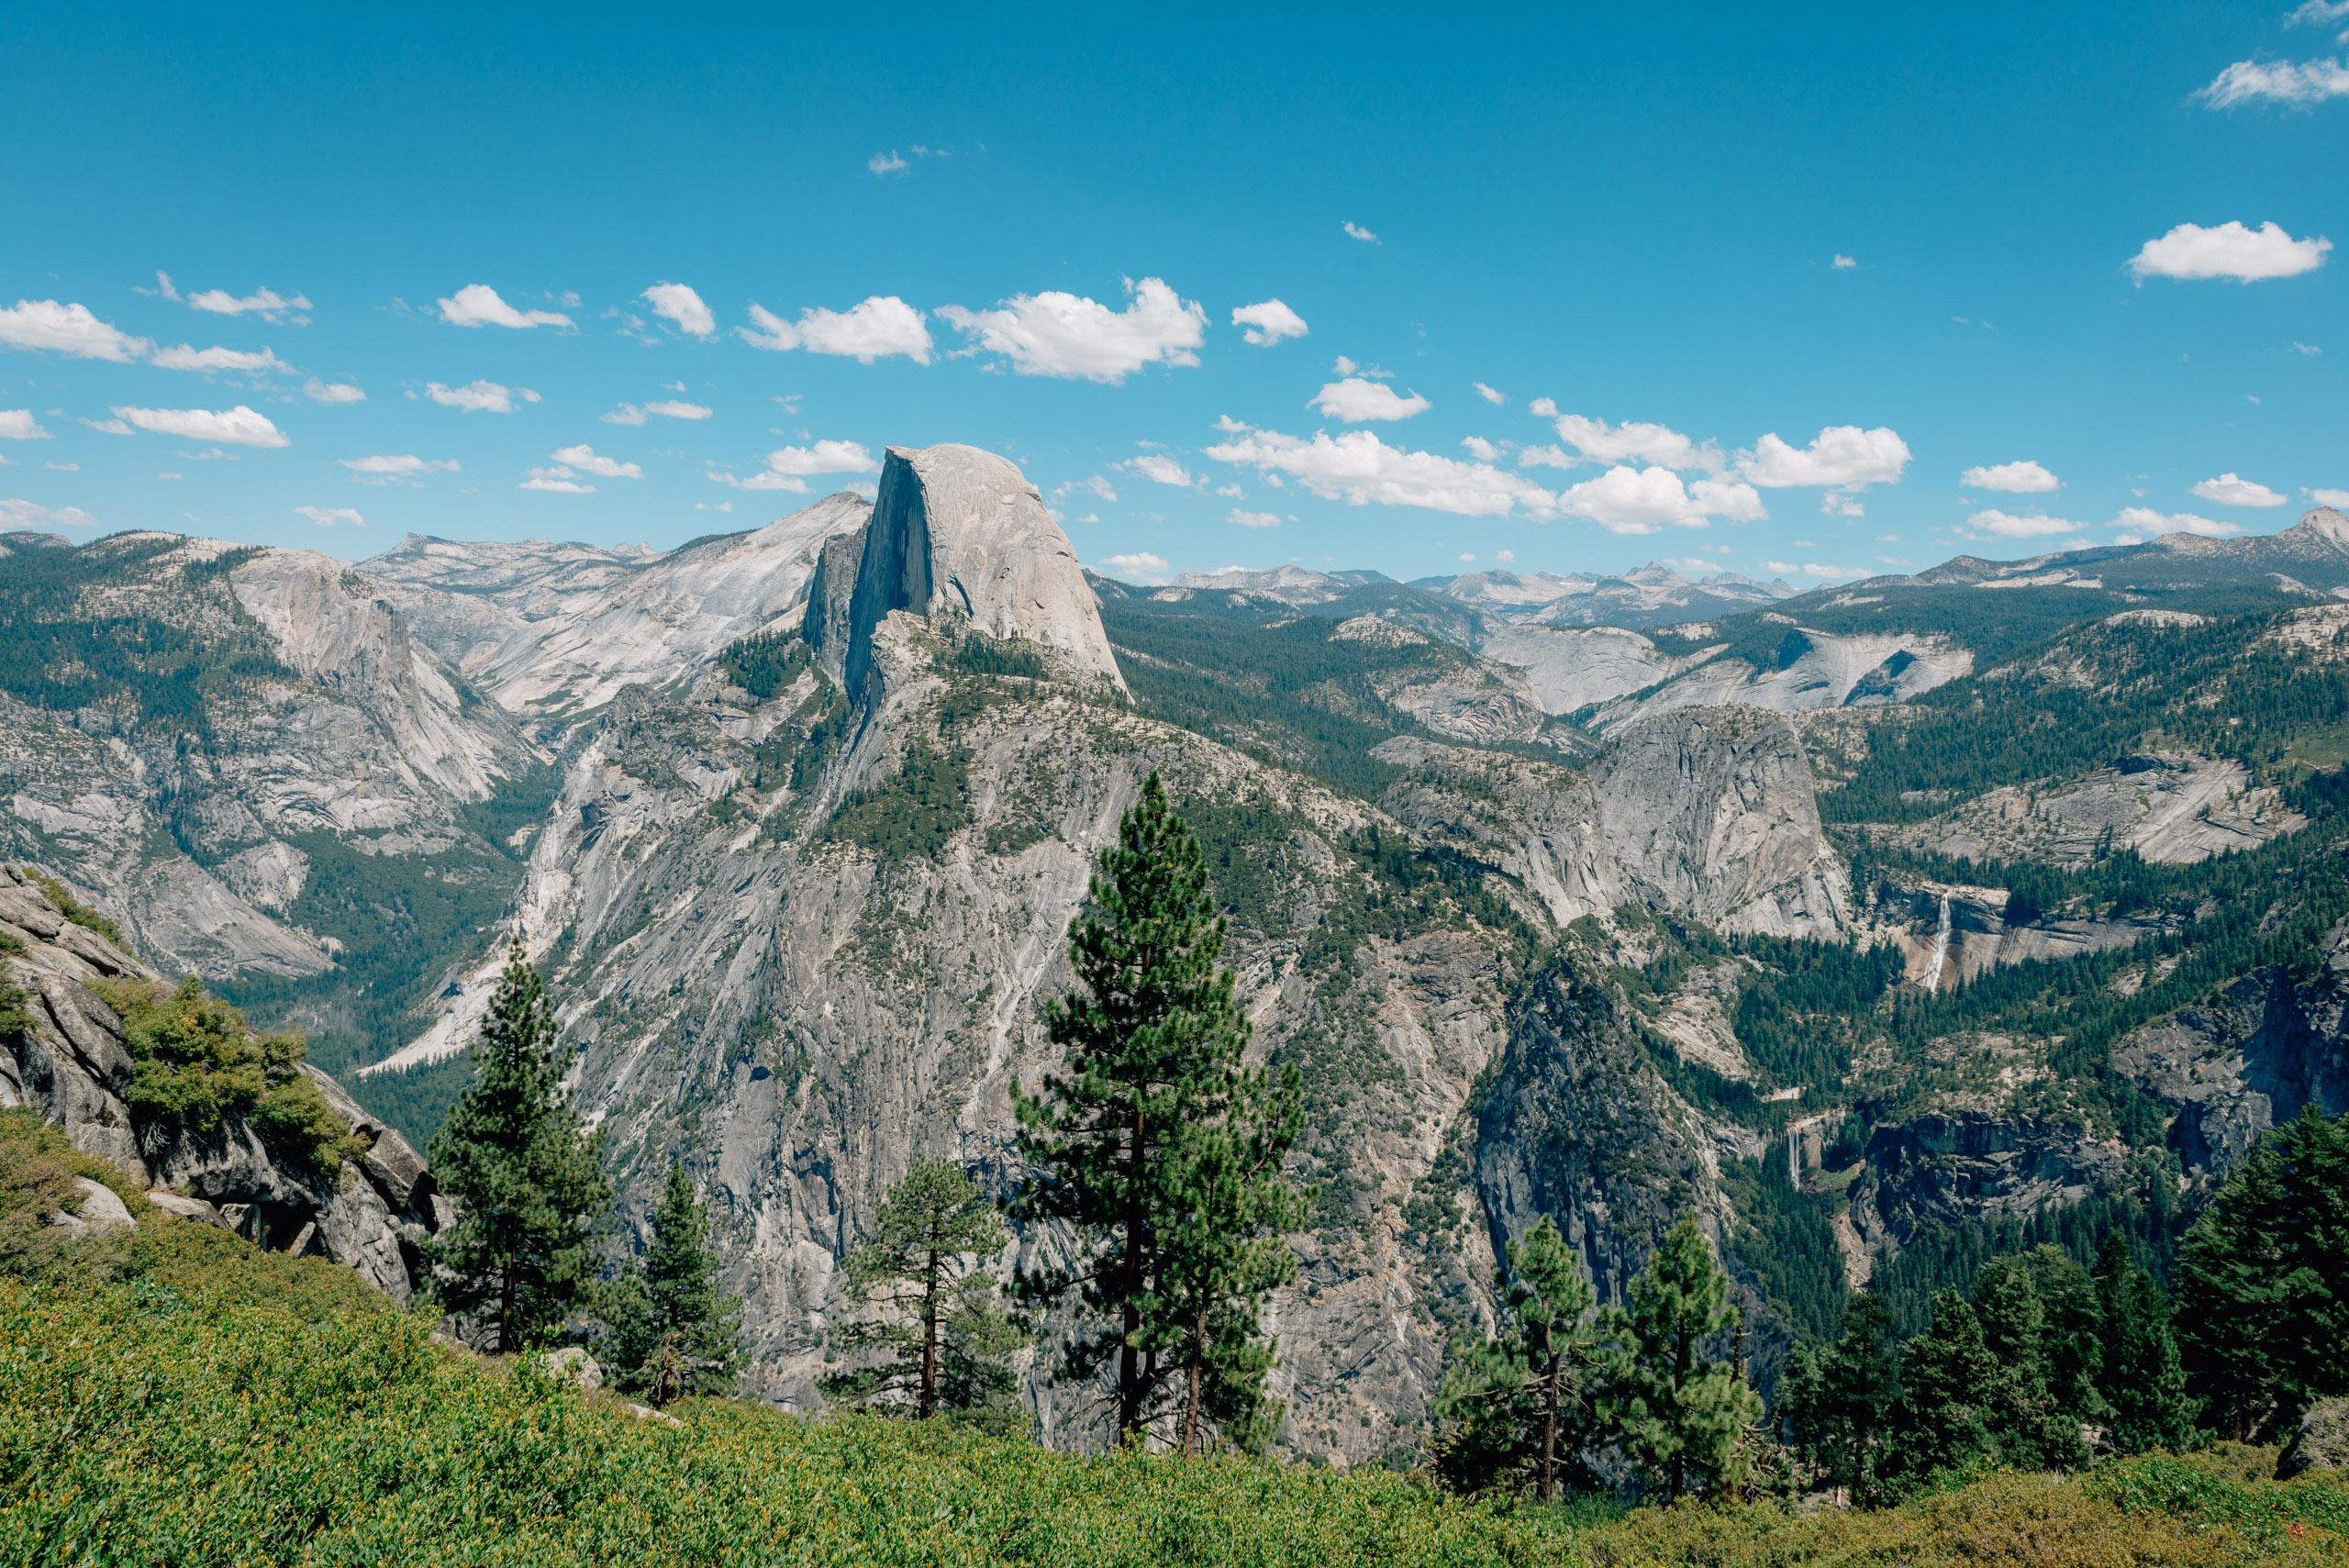 Yosemite National Park - 2012 - 2012-0721-DSC_0151_93088